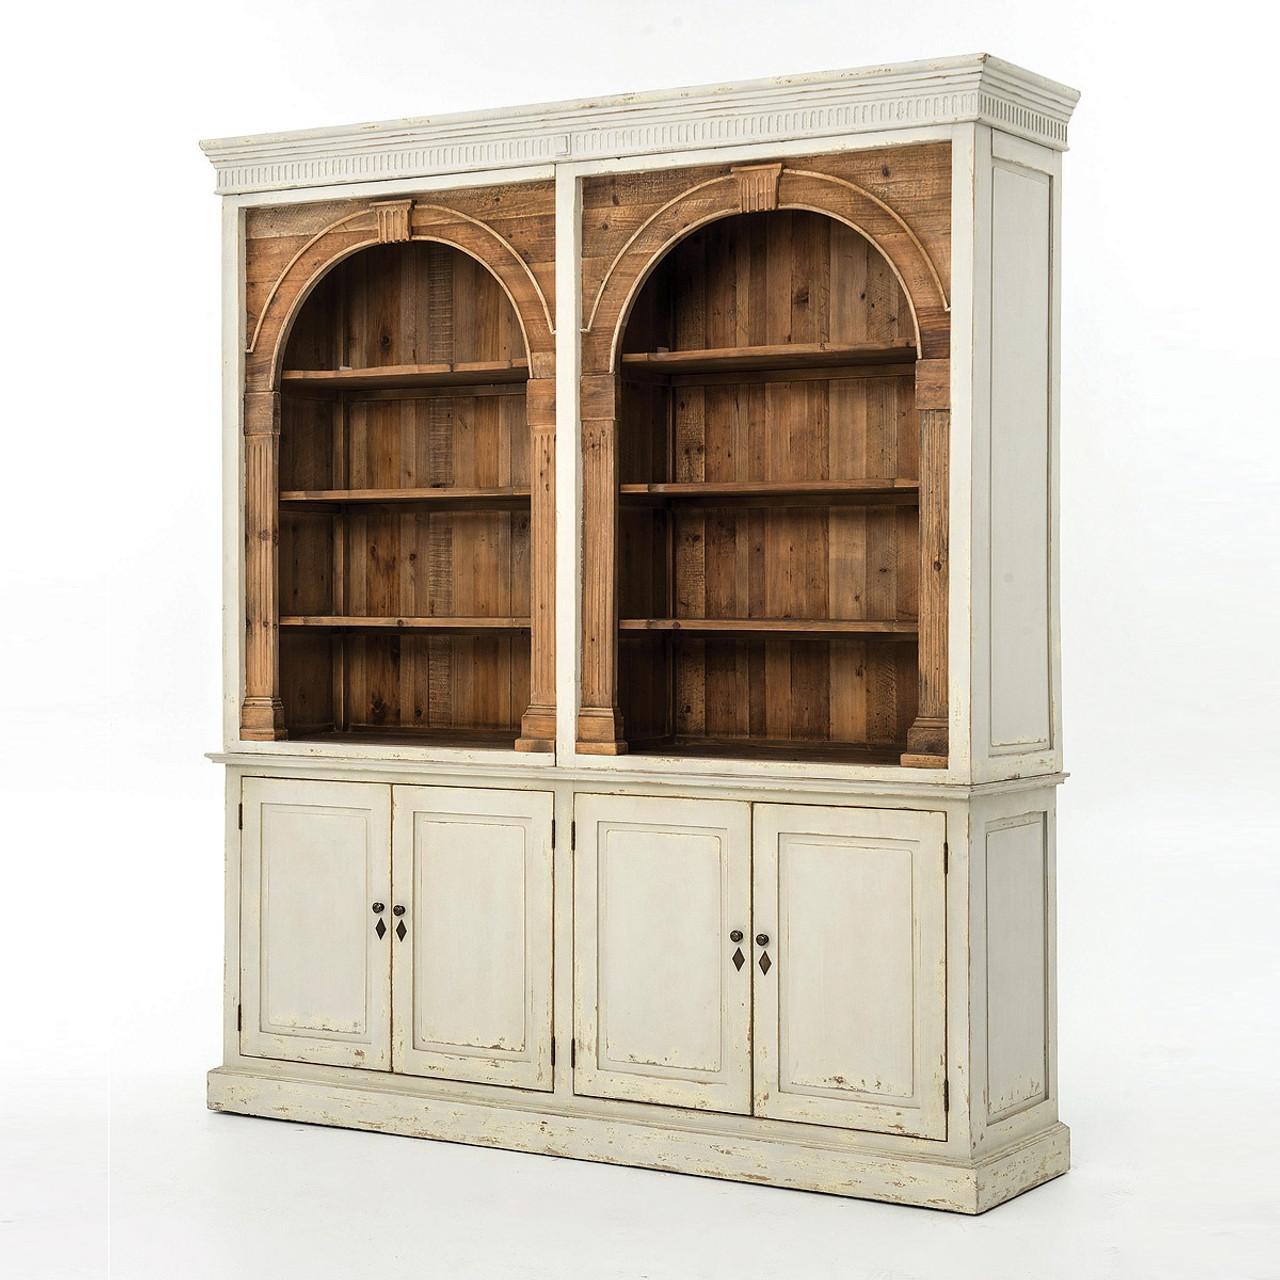 Swedish Grey Rustic Reclaimed Wood China Cabinet Hutch | Zin Home